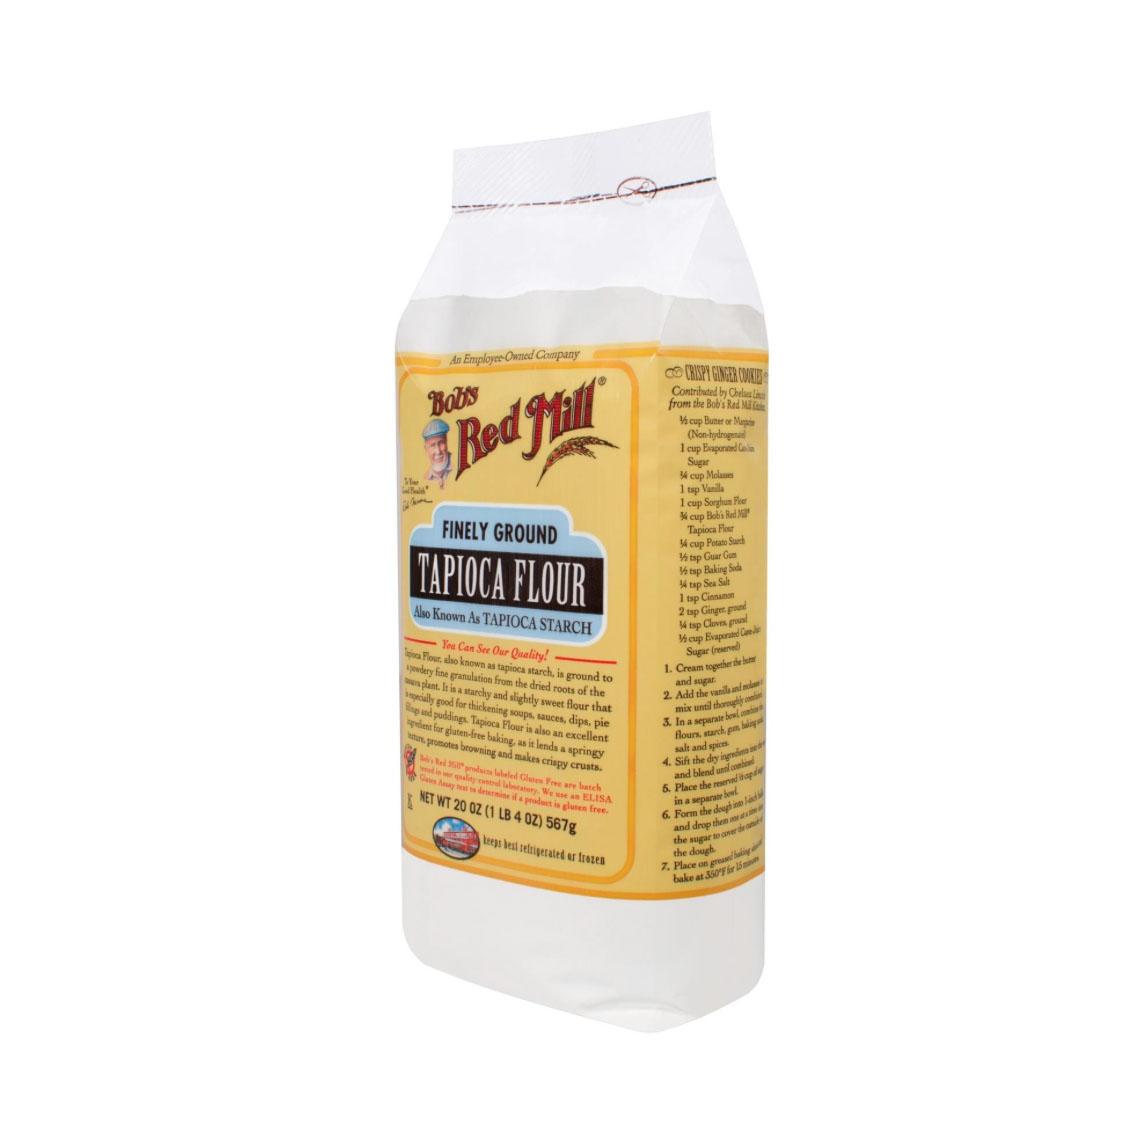 Bobs red mill tapioca flour (tapioca starch) 500 gr